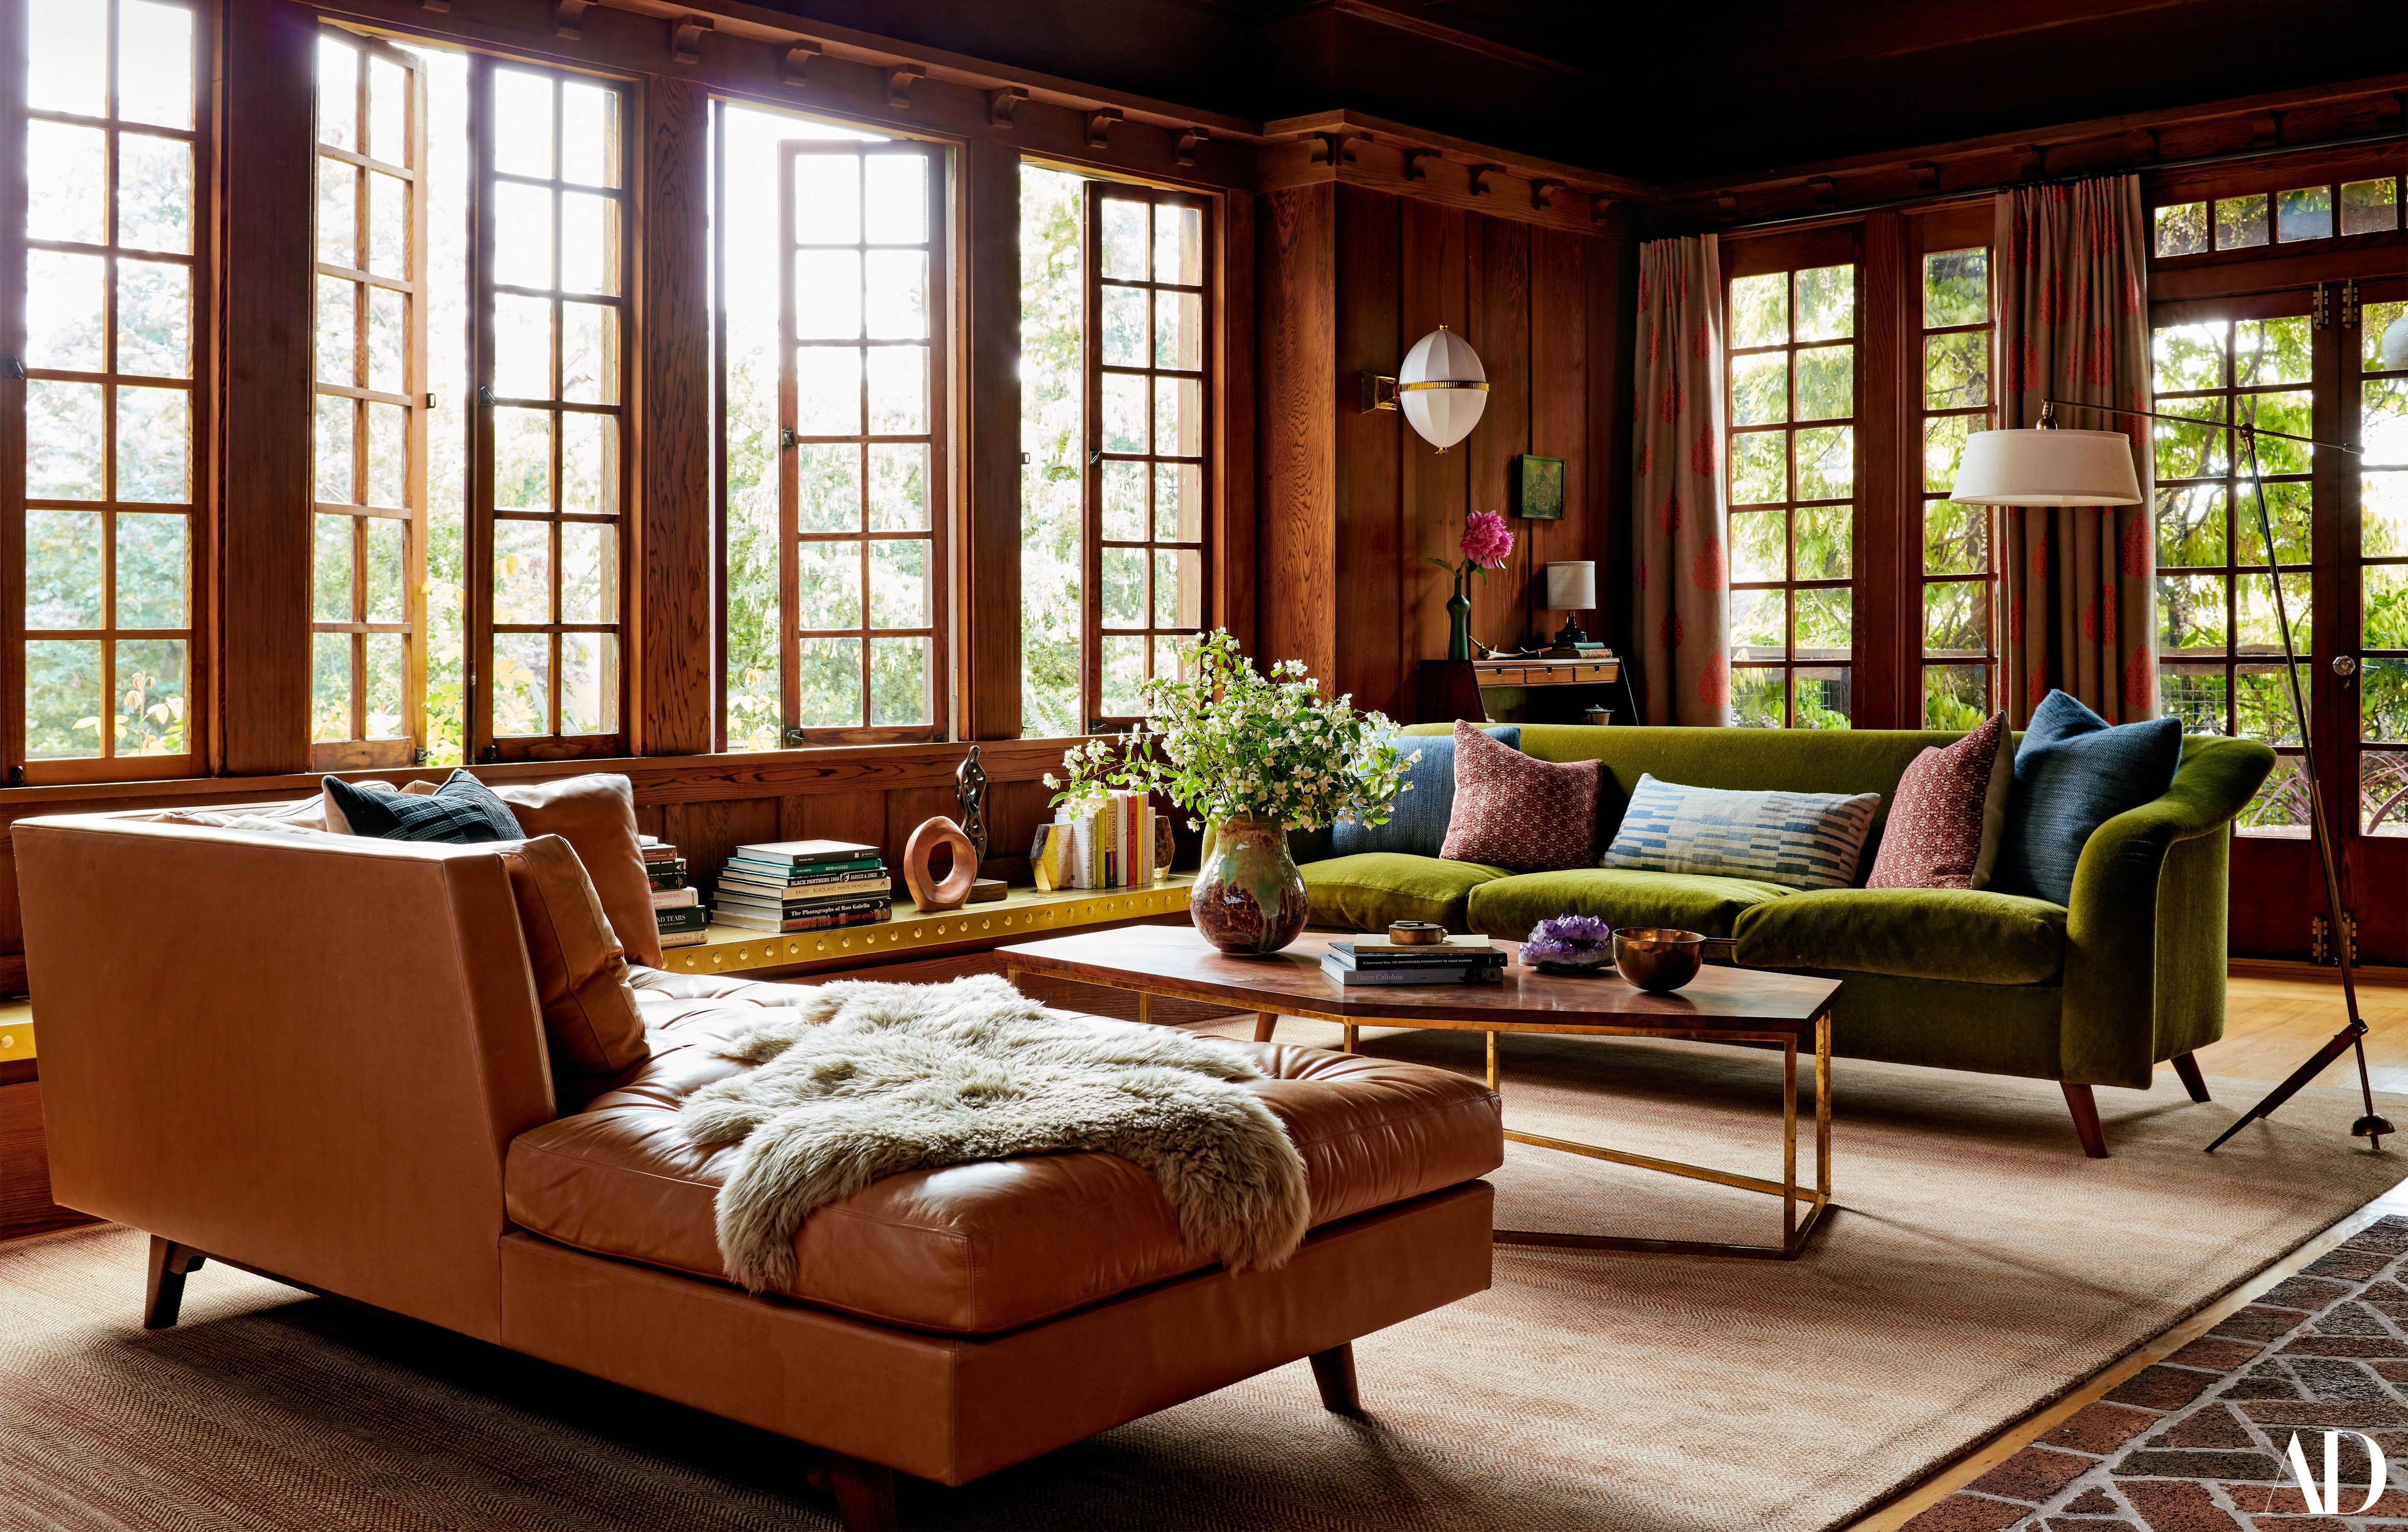 Superior Berkeley Interior Design. Inside The Berkeley Home Of Jennifer Doebler And  Pat Kelly Photos |